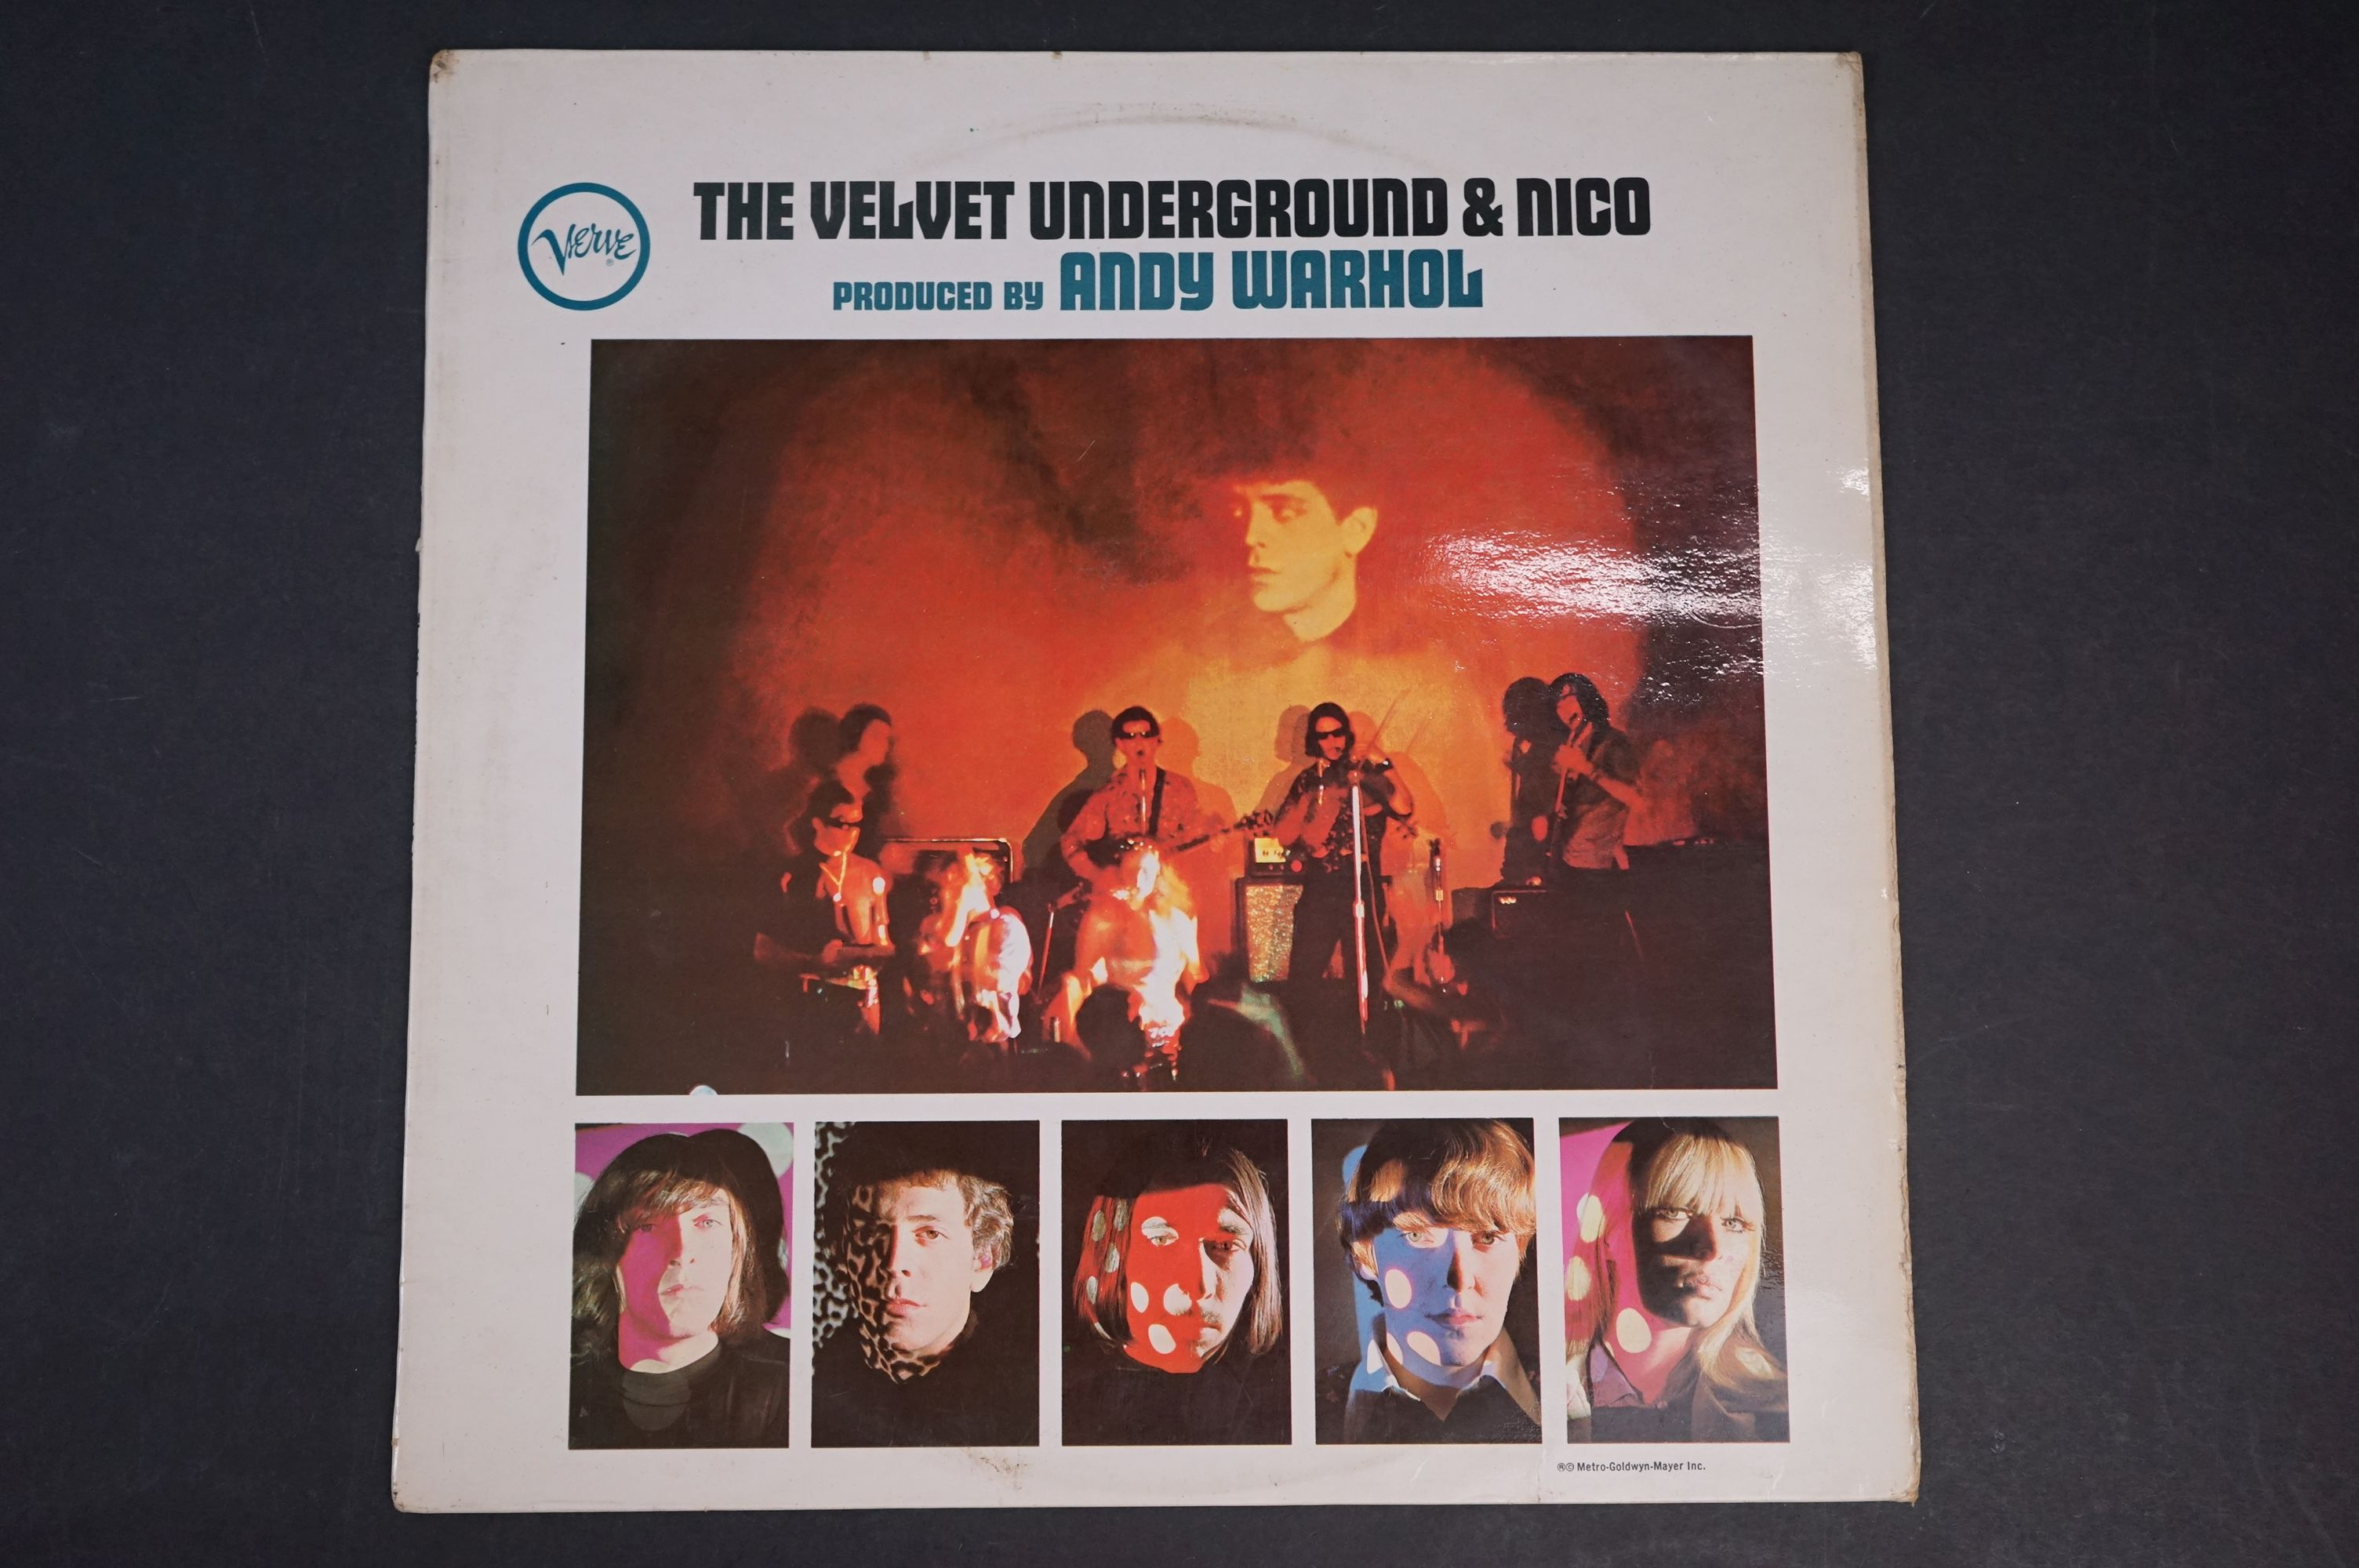 Vinyl - The Velvet Underground & Nico produced by Andy Warhol LP on Verve VLP9184 mono, non banana